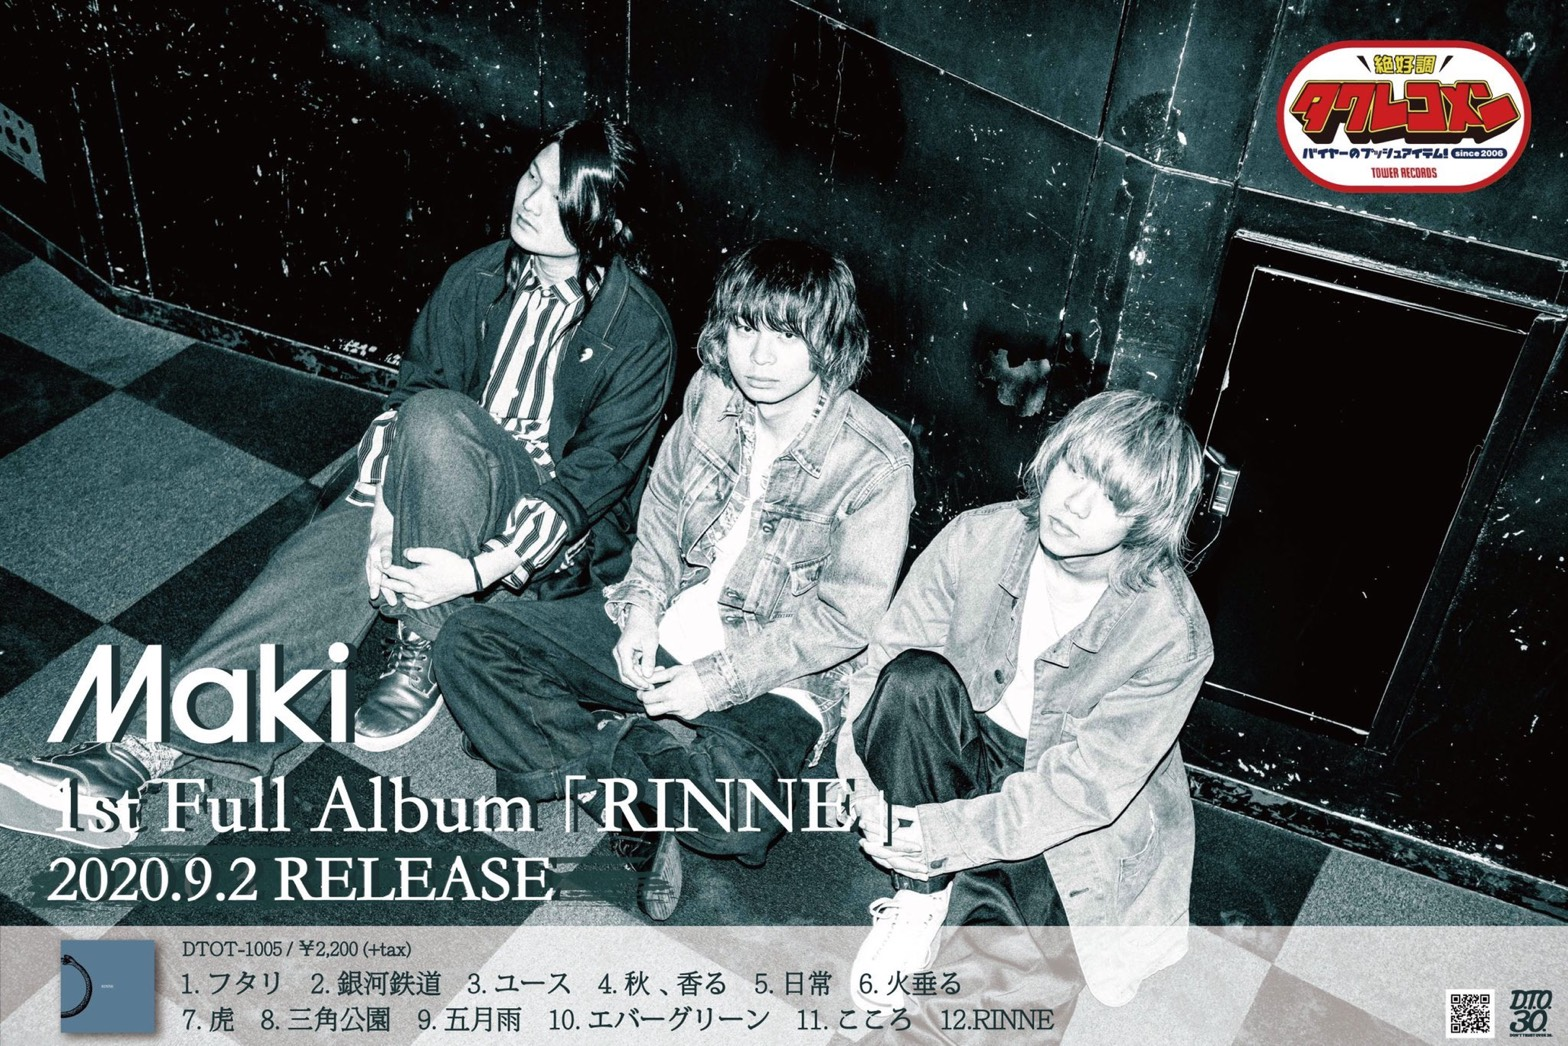 2021年1月17日日曜日 Maki 1st Full Album RINNE Release Tour 「大四喜」